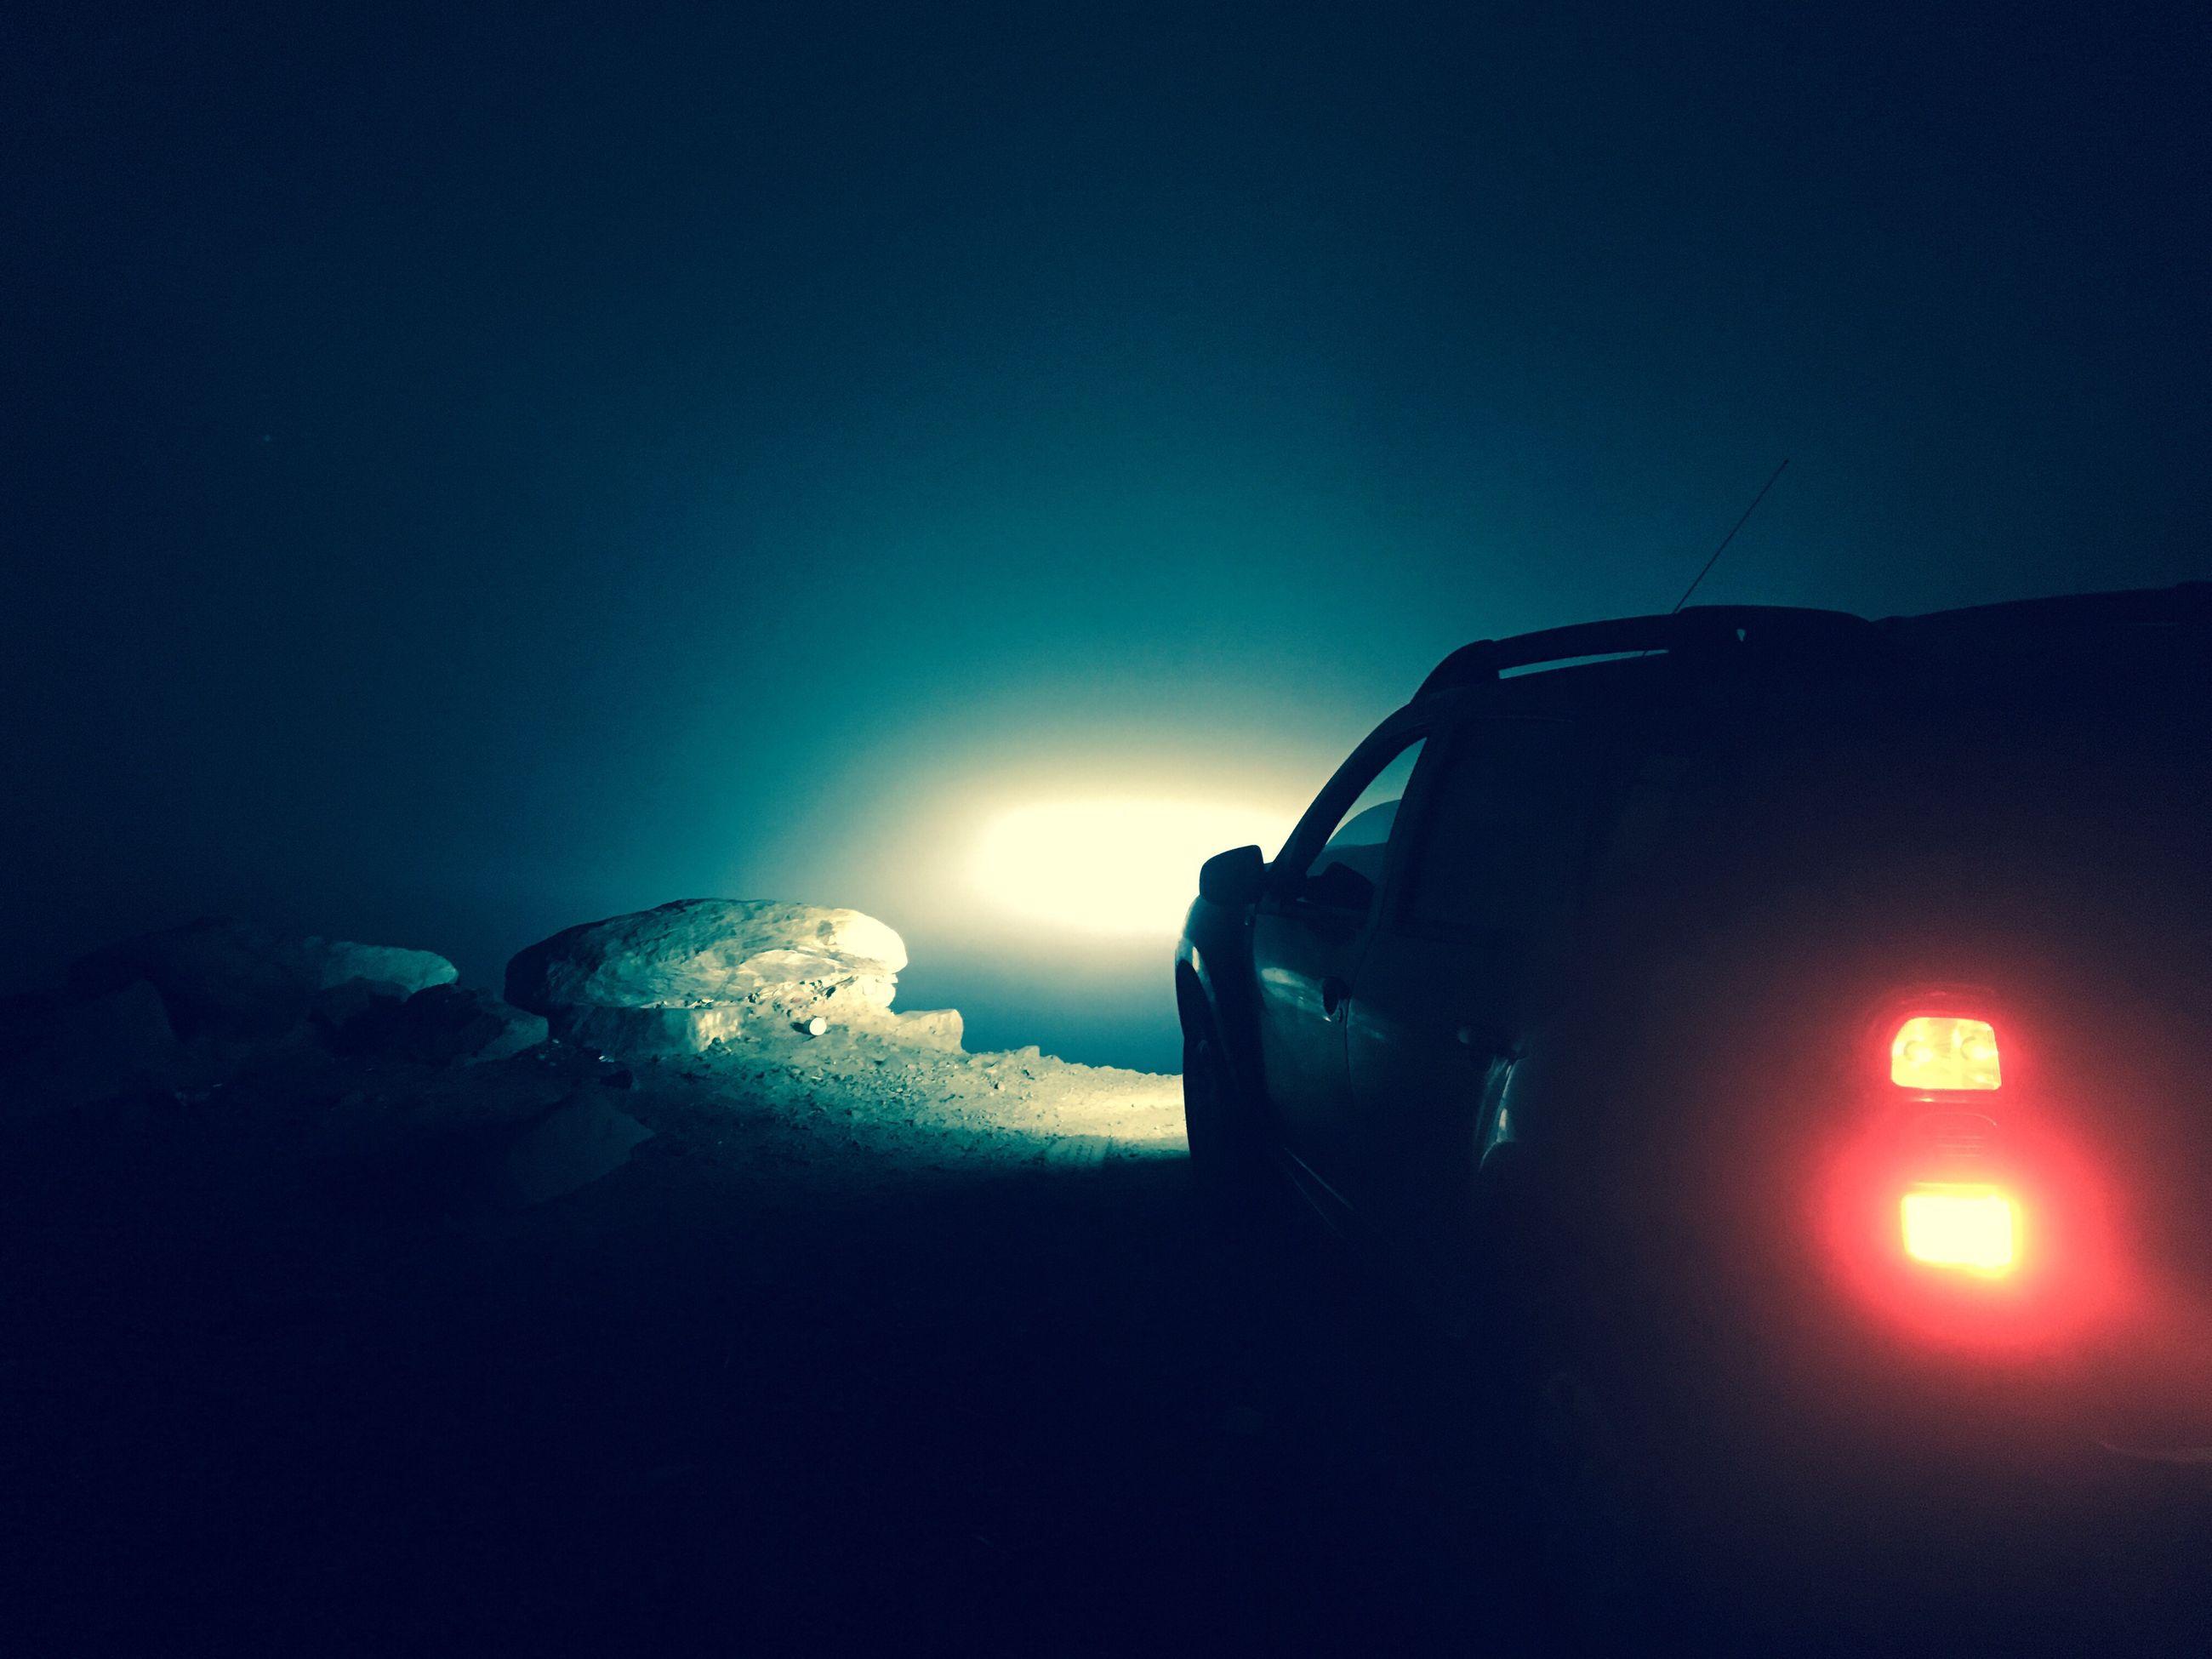 illuminated, night, transportation, lighting equipment, land vehicle, car, no people, sky, nature, architecture, outdoors, close-up